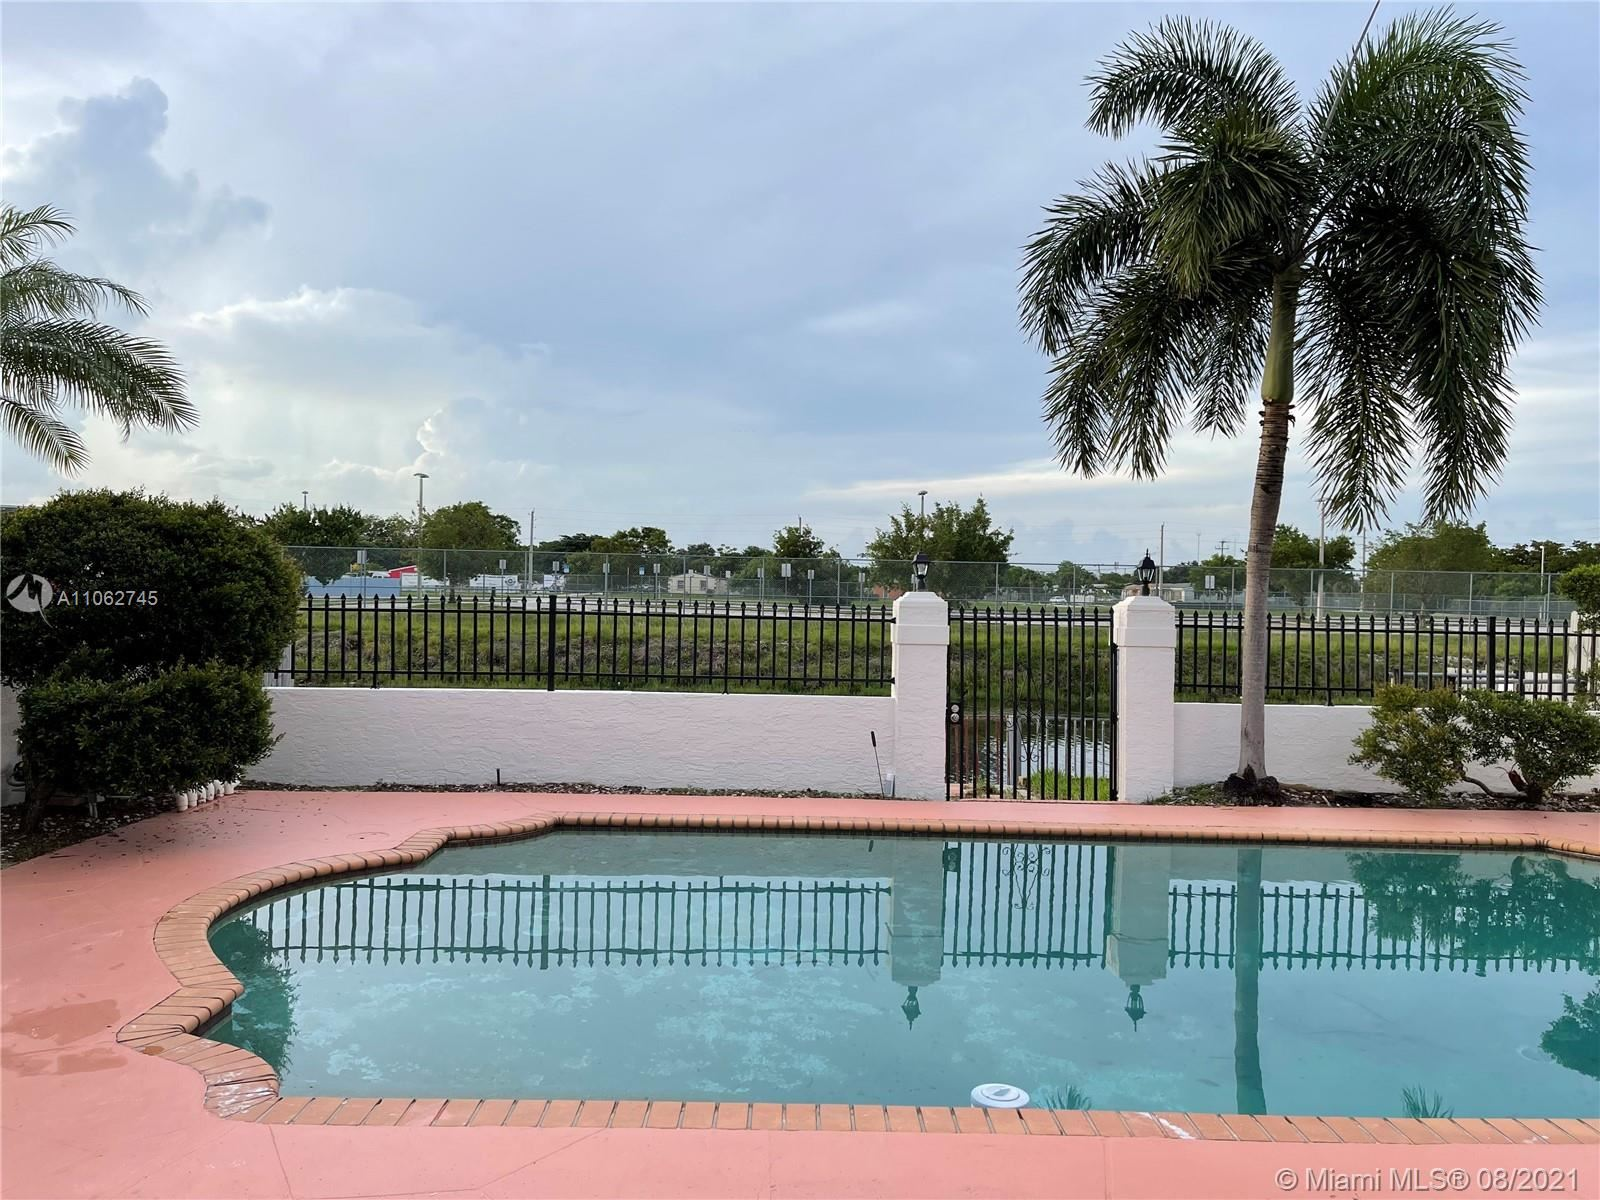 1731 NW 155th St, Miami Gardens, FL 33054 - #: A11062745